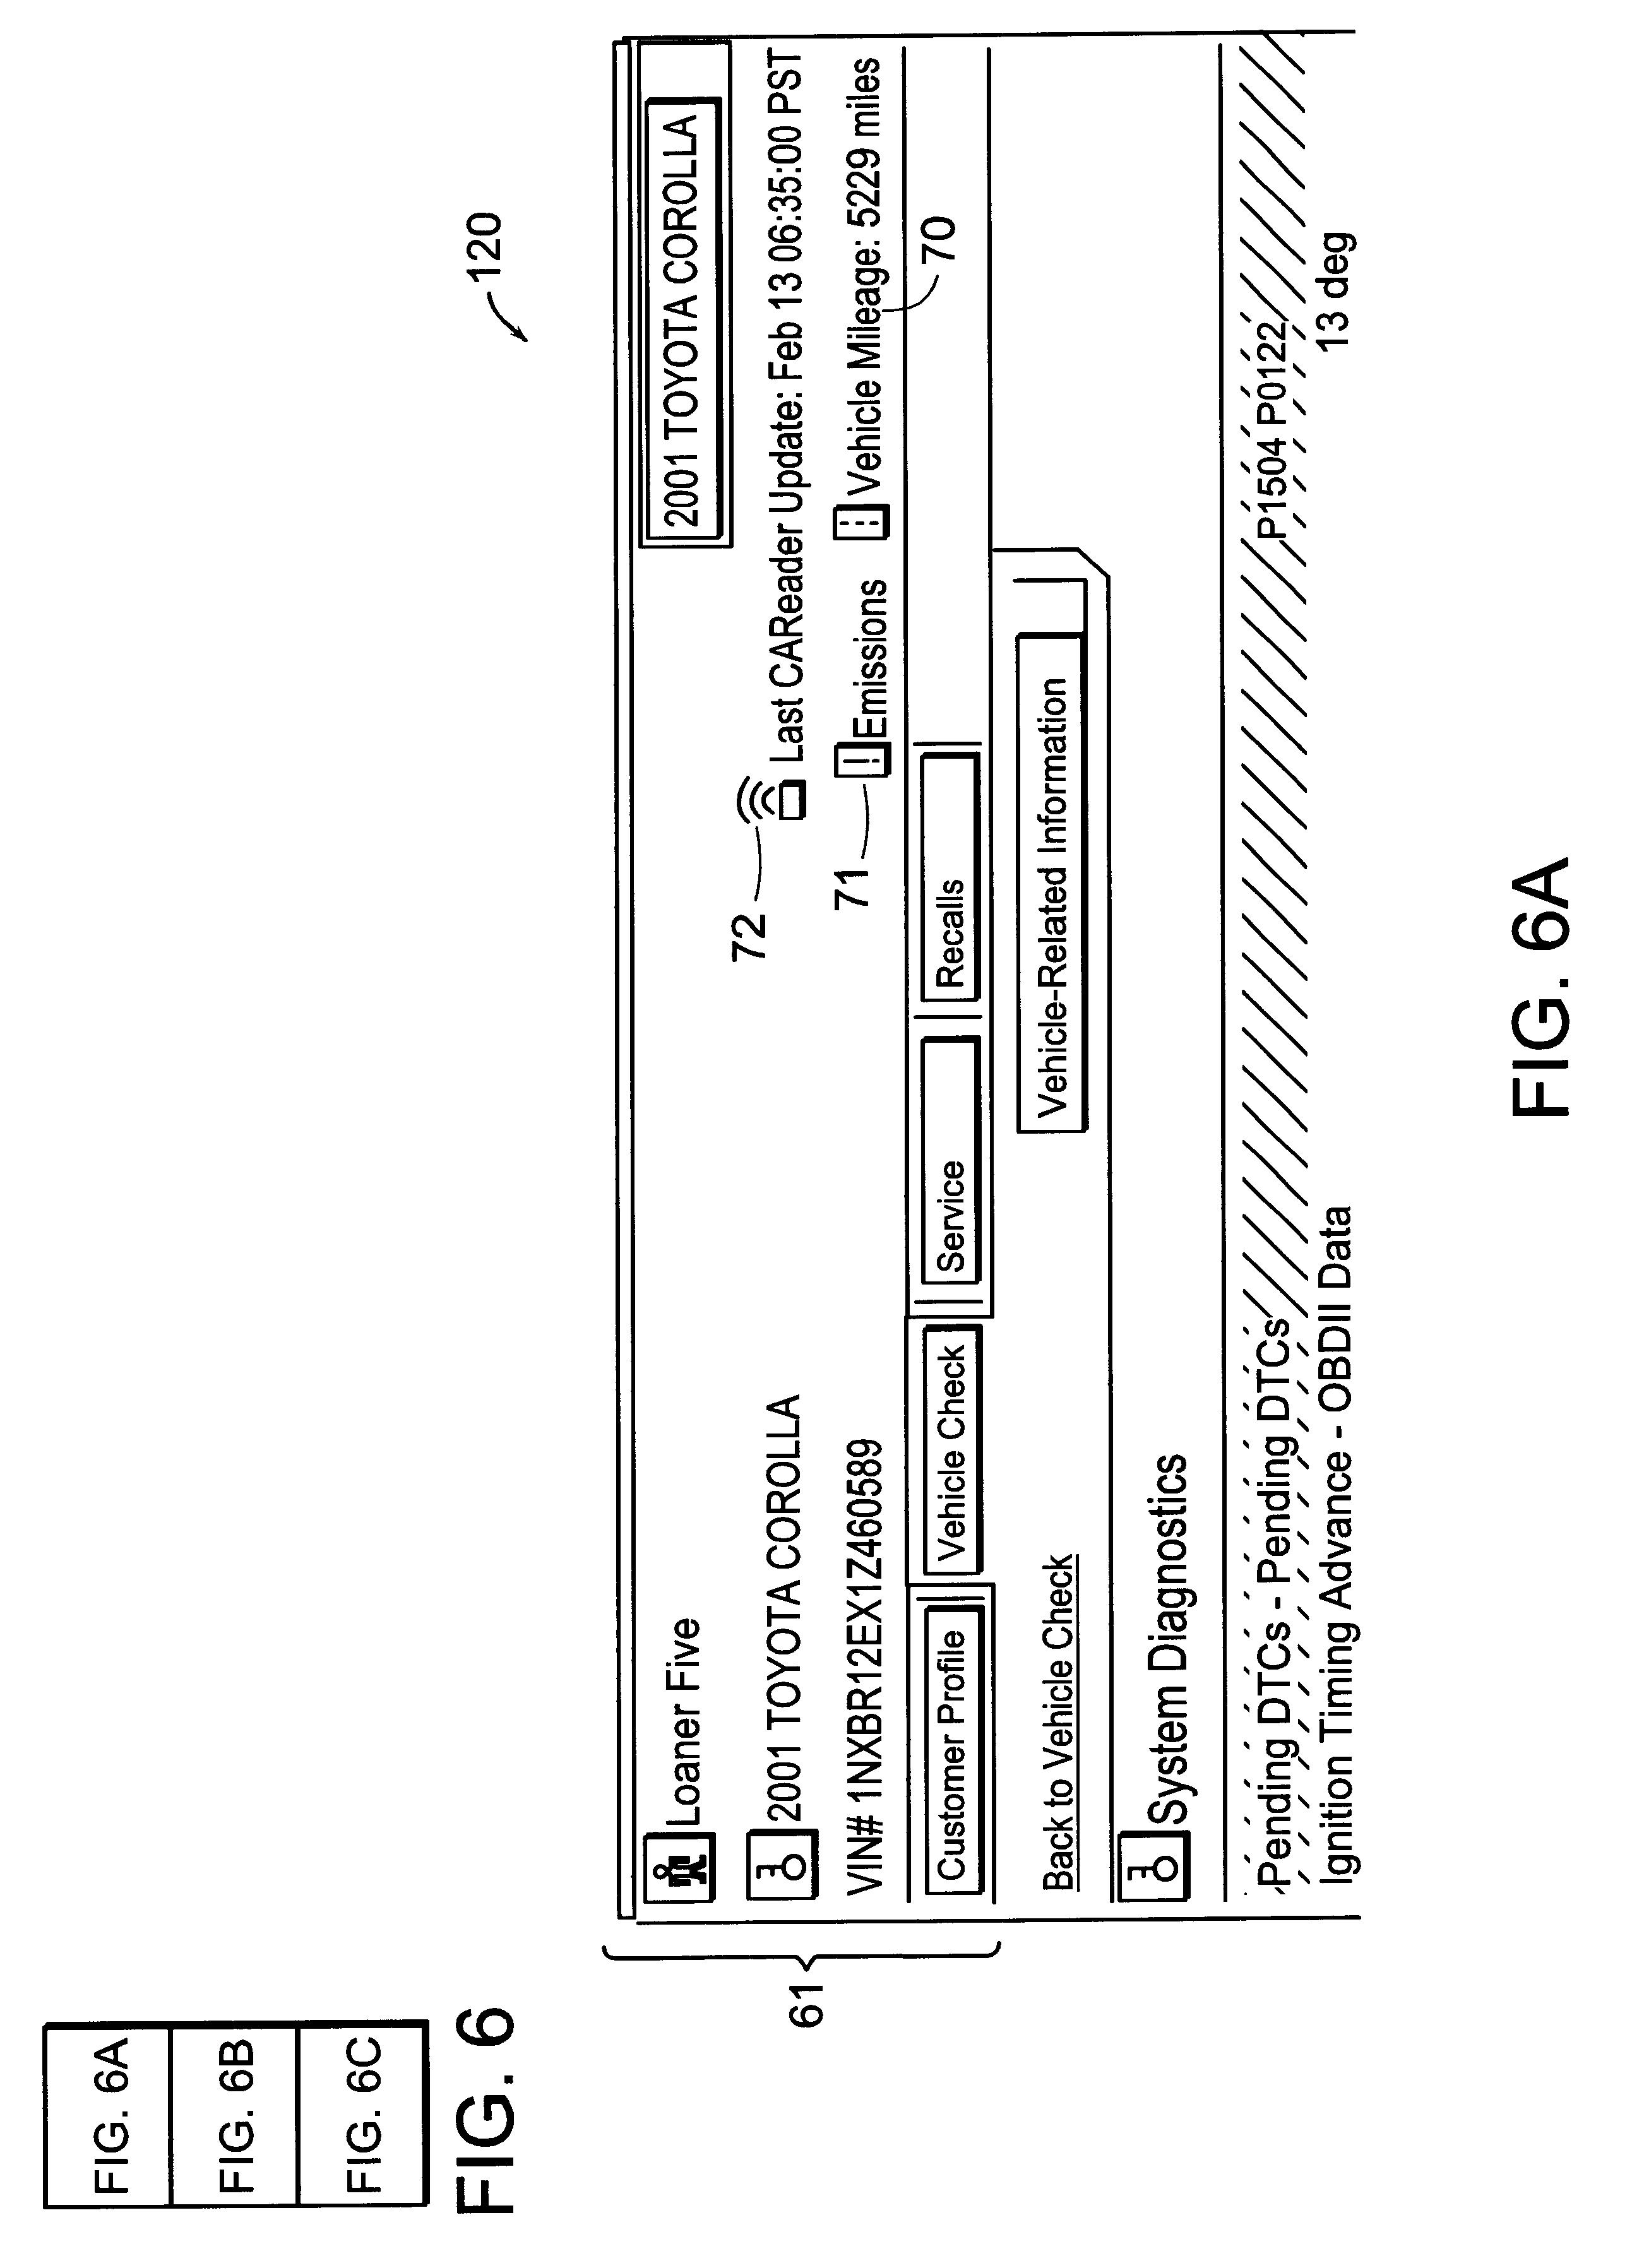 Patente US Internetbased Vehiclediagnostic System - Car signs on dashboardrobert jacek google